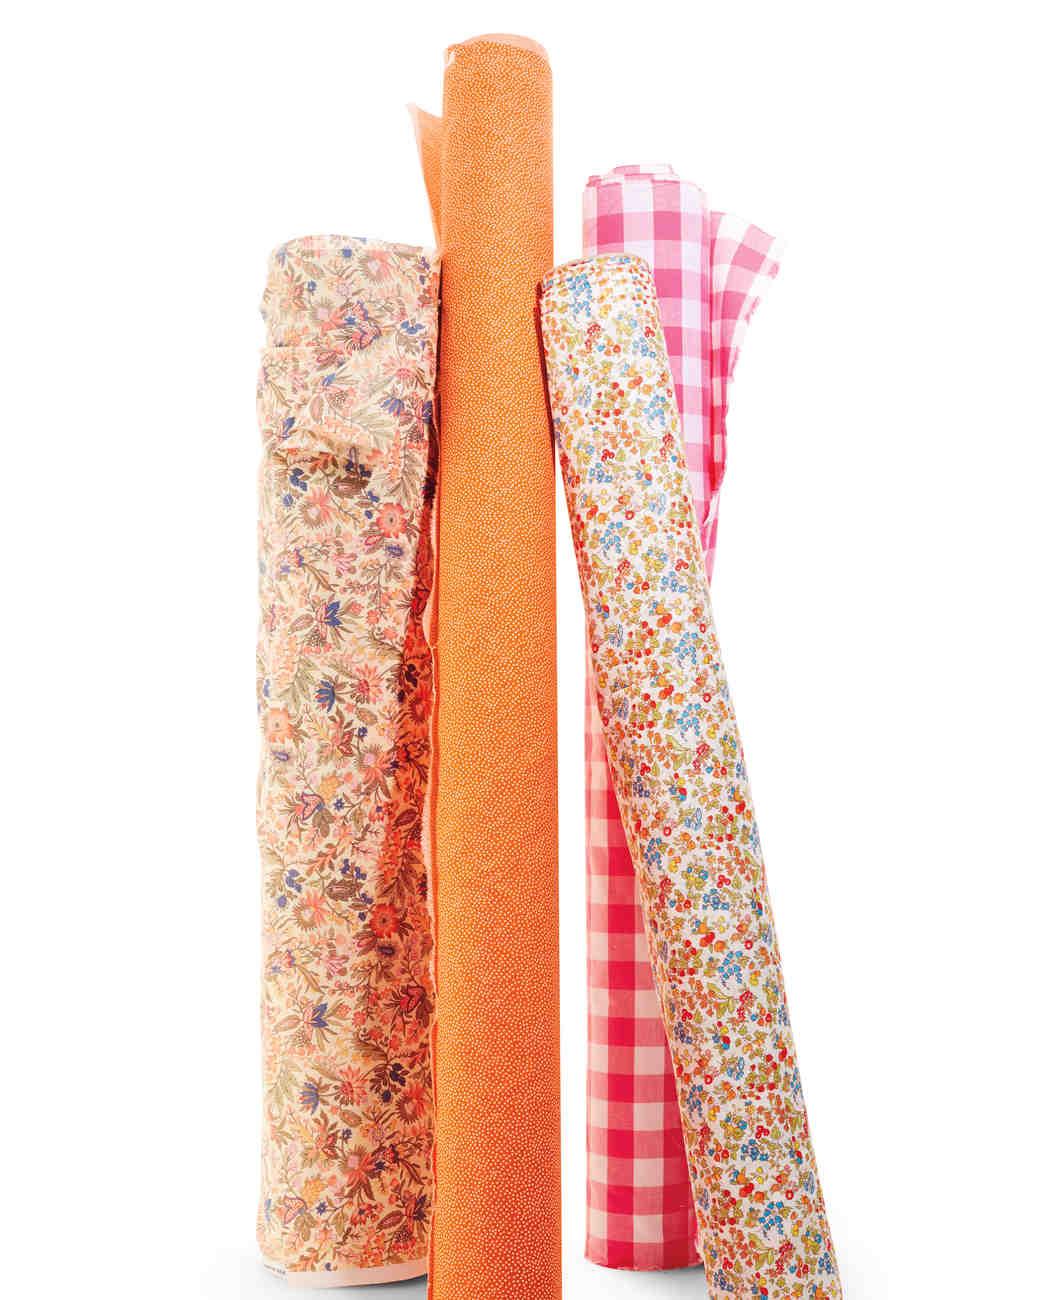 fabric-rolls-230-mwd110687.jpg